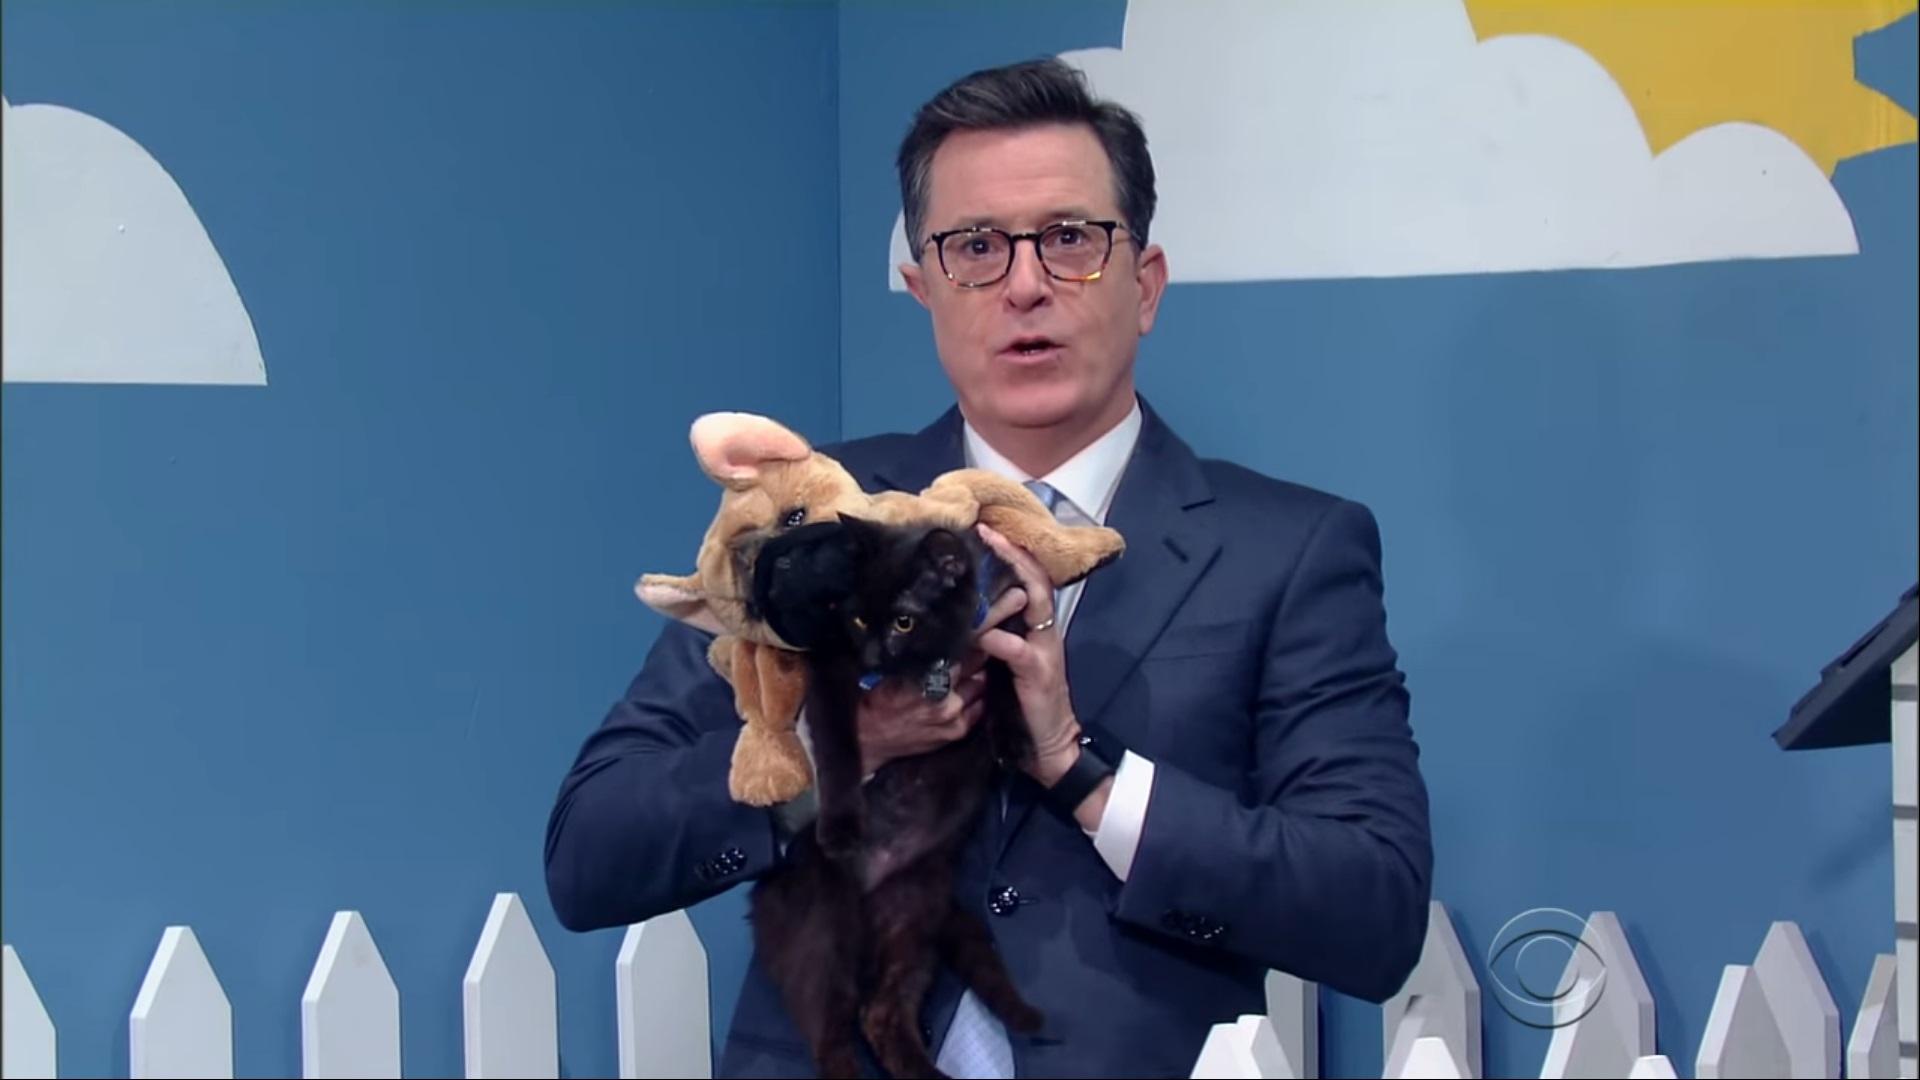 Bryan Cranston Puppies 3